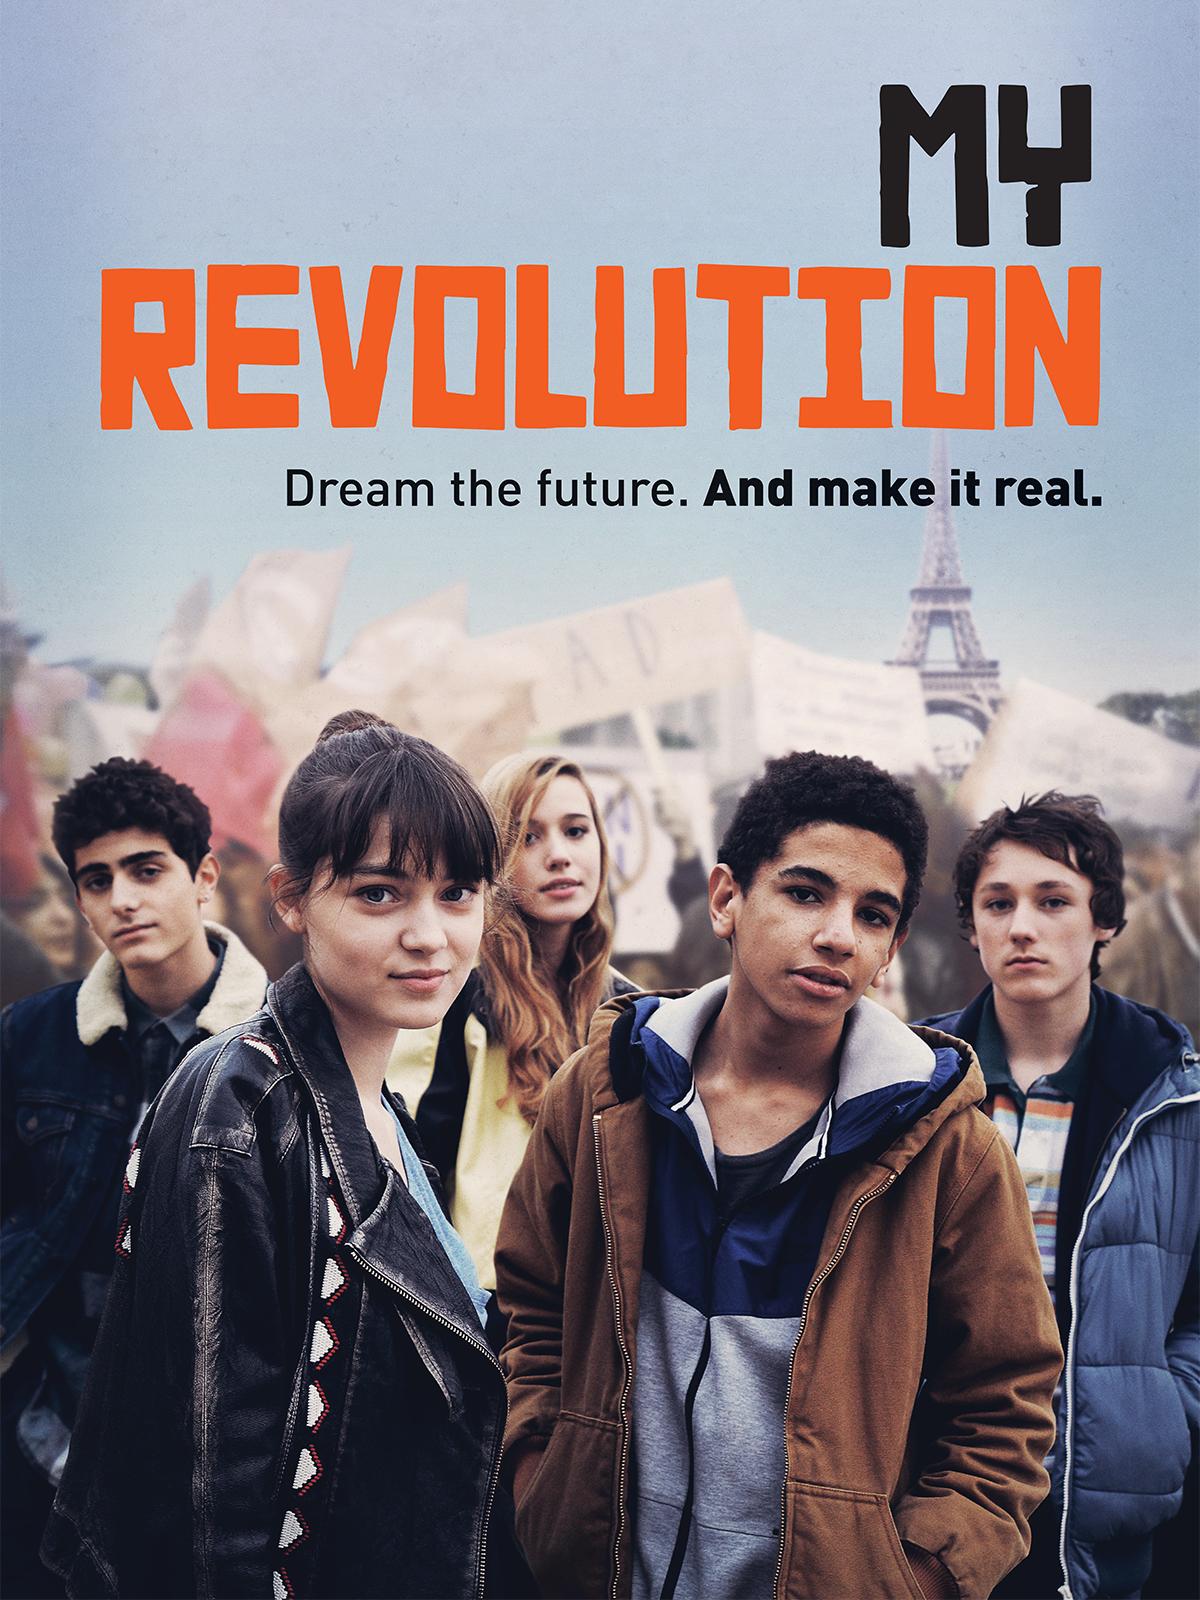 My Revolution